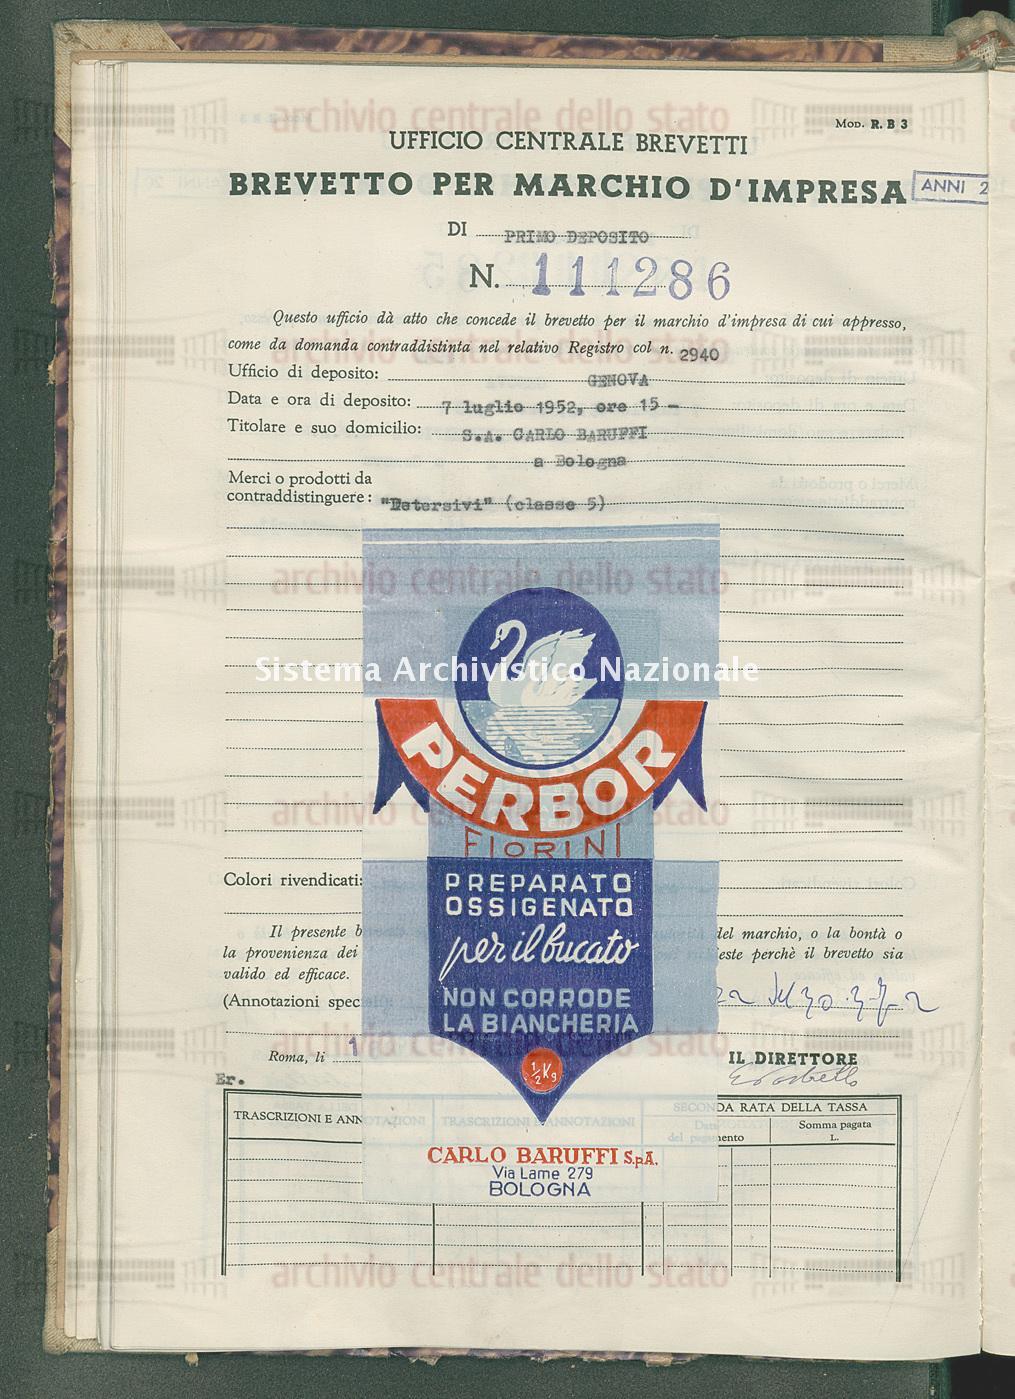 'Detersivi' S.A.Carlo Baruffi (16/04/1953)